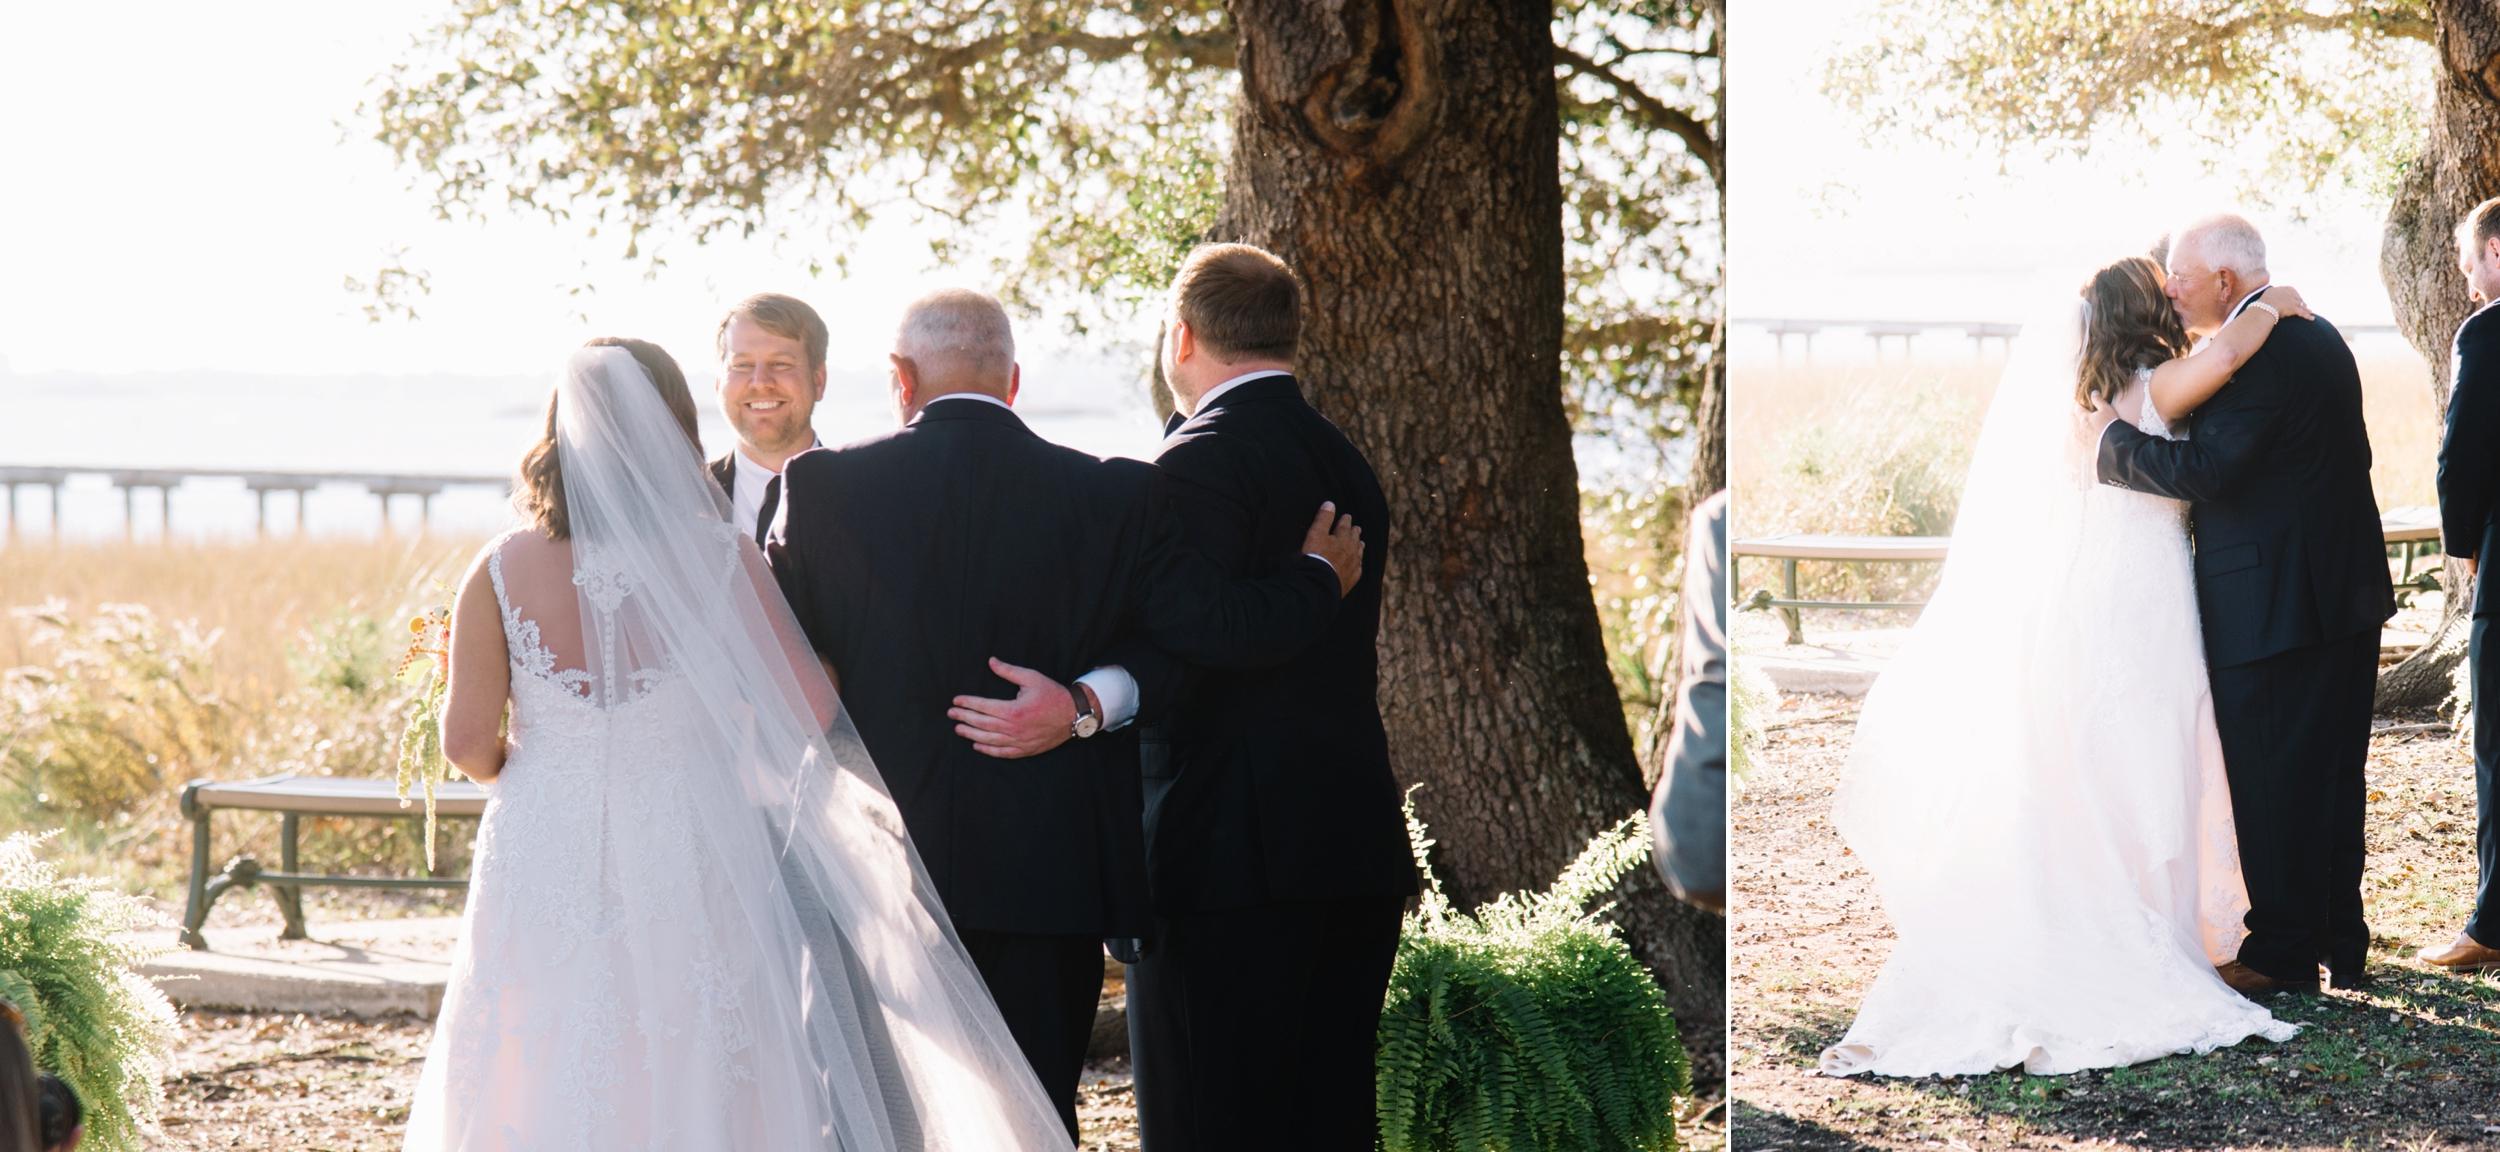 Charleston-wedding-photographer-62.jpg